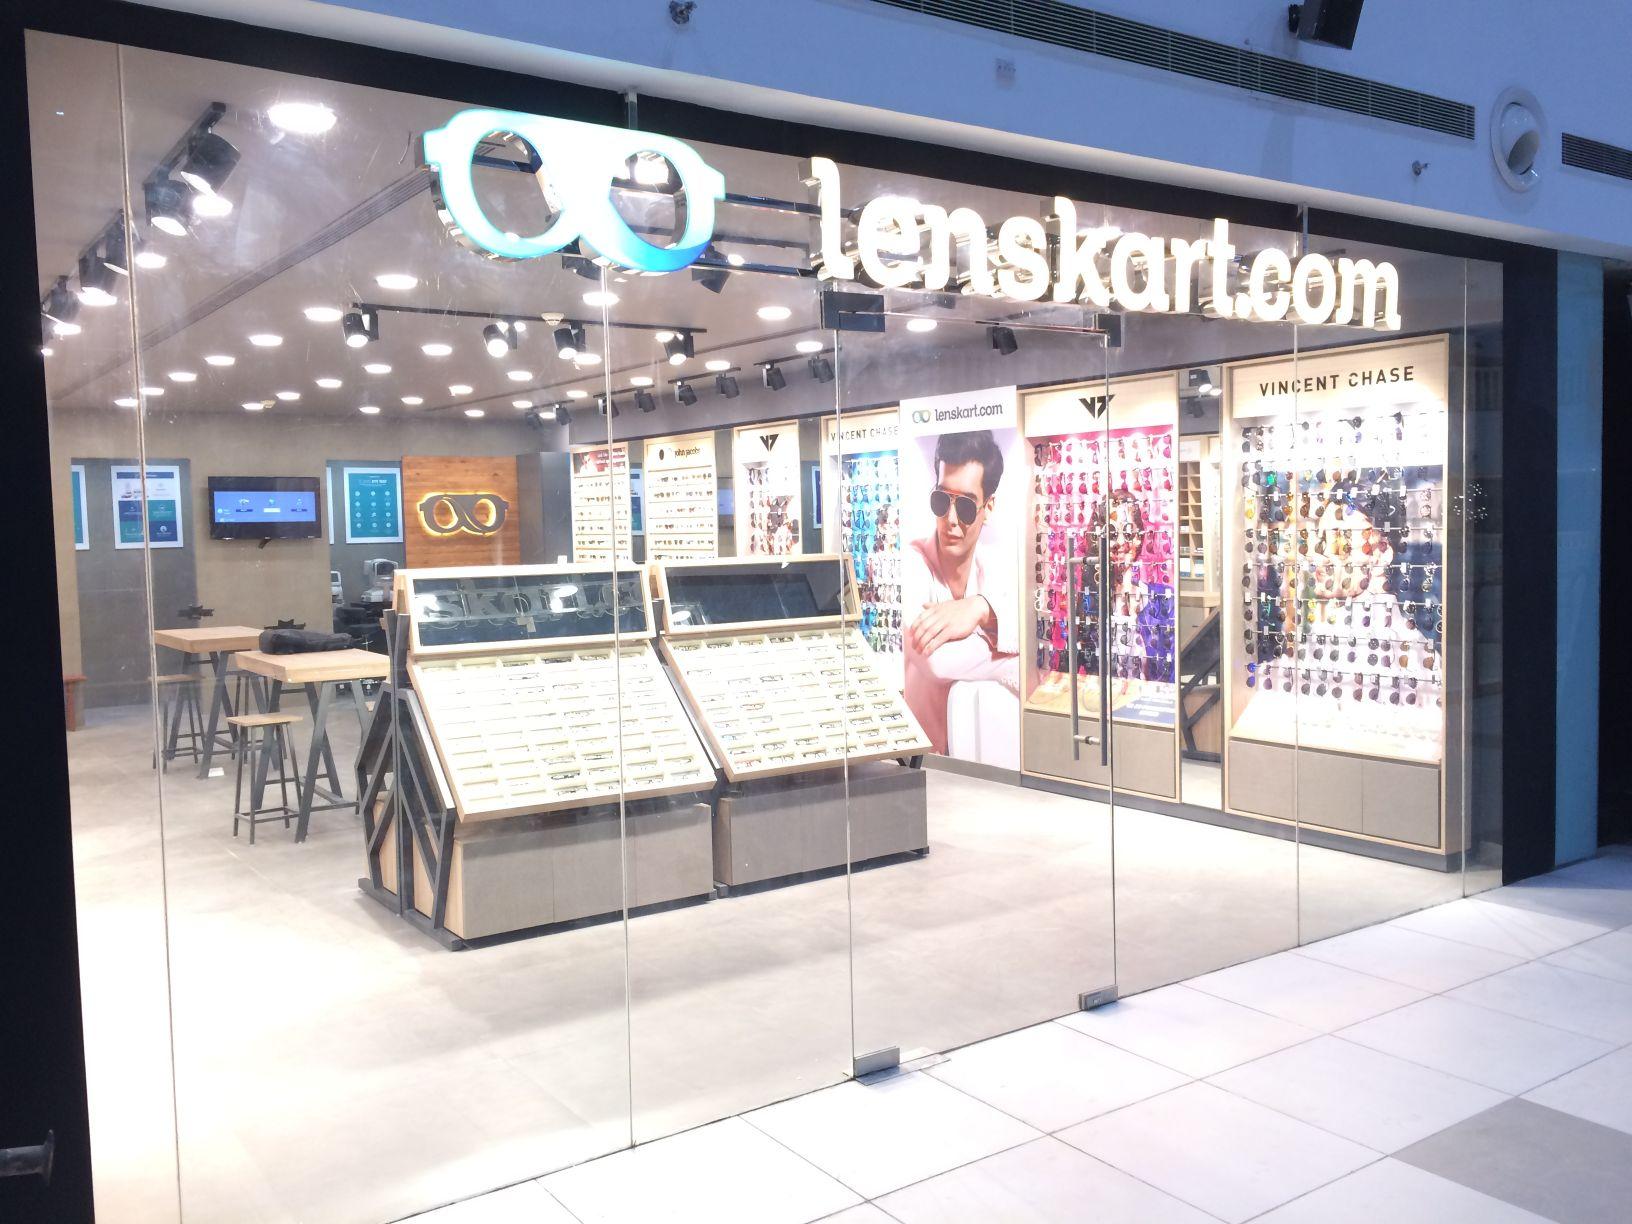 Lenskart.com - Omaxe Connaught Place Mall, Beta 2, Greater Noida